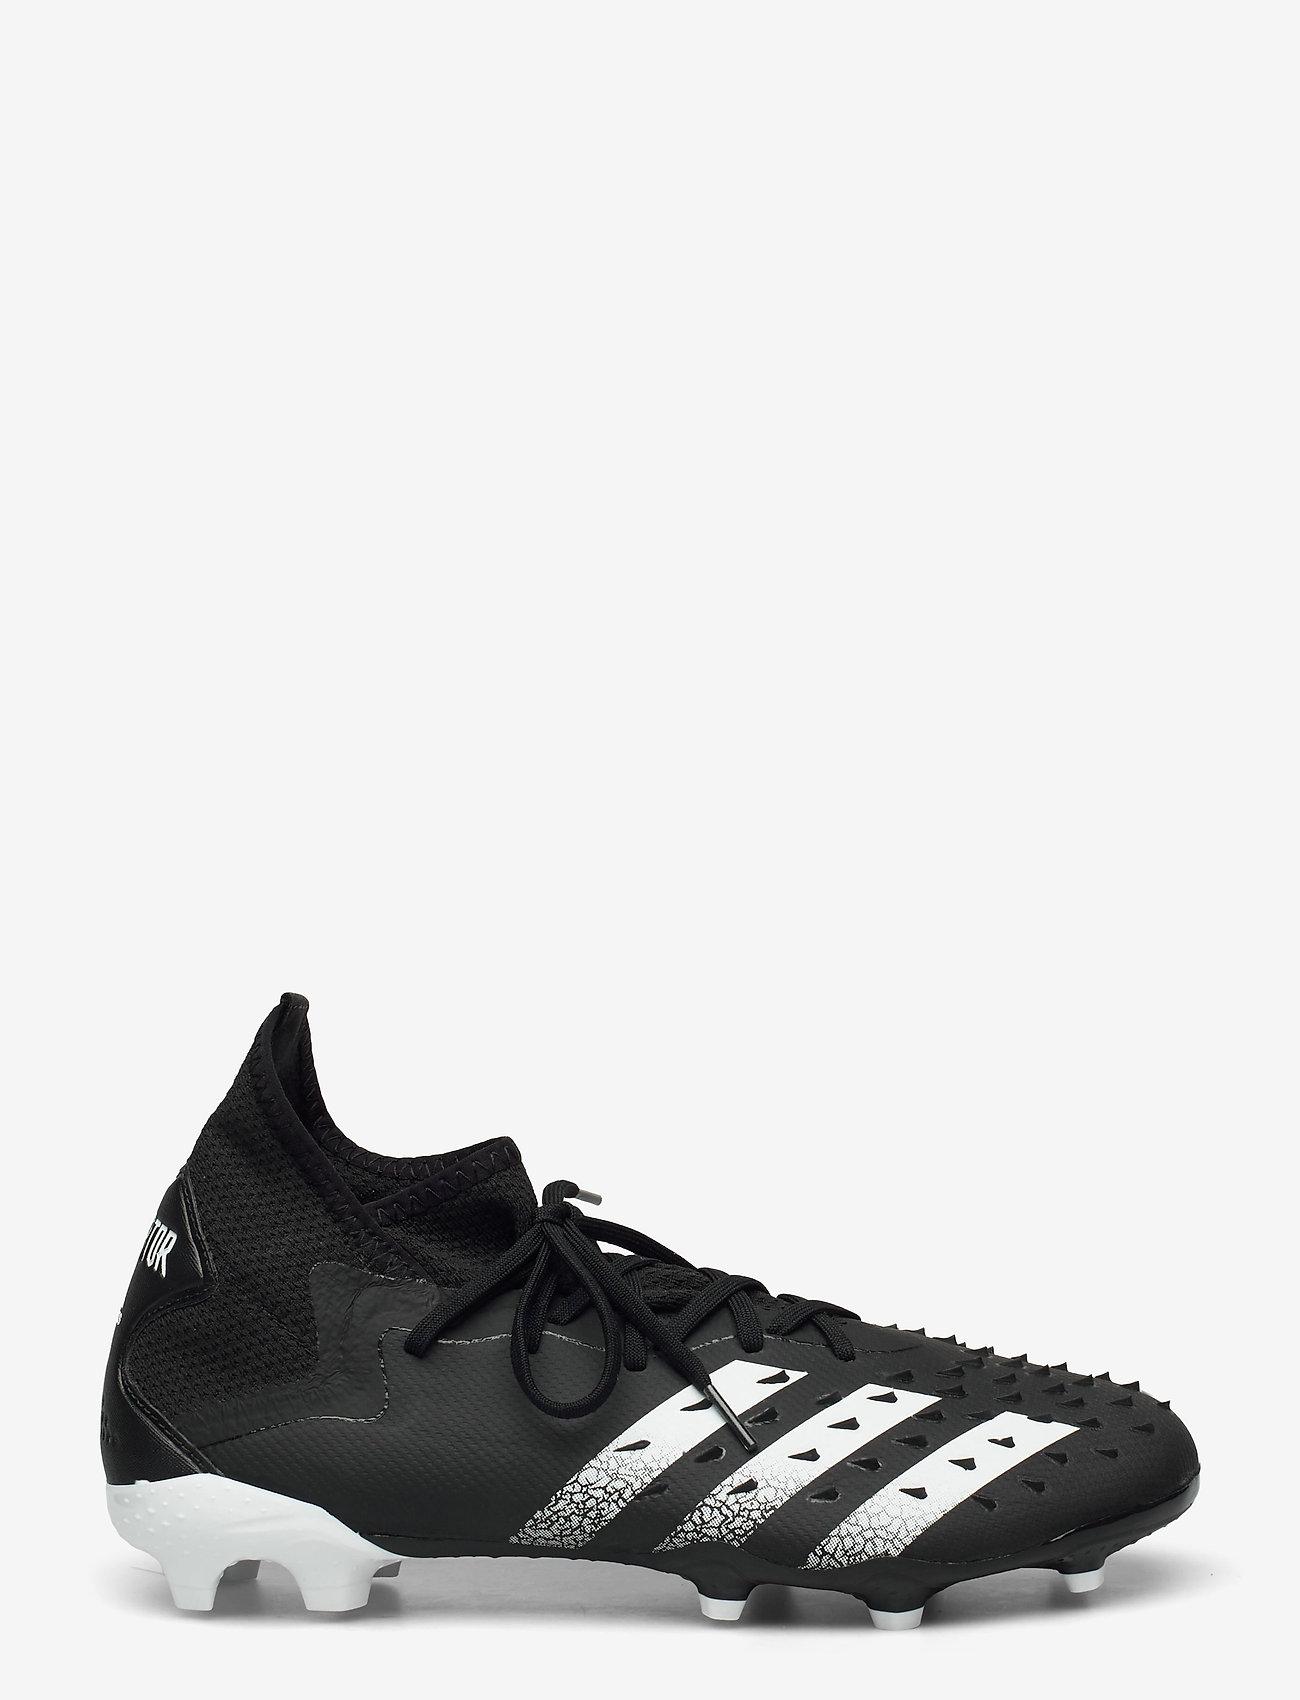 adidas Performance - PREDATOR FREAK .2 FG - fodboldsko - cblack/ftwwht/cblack - 1